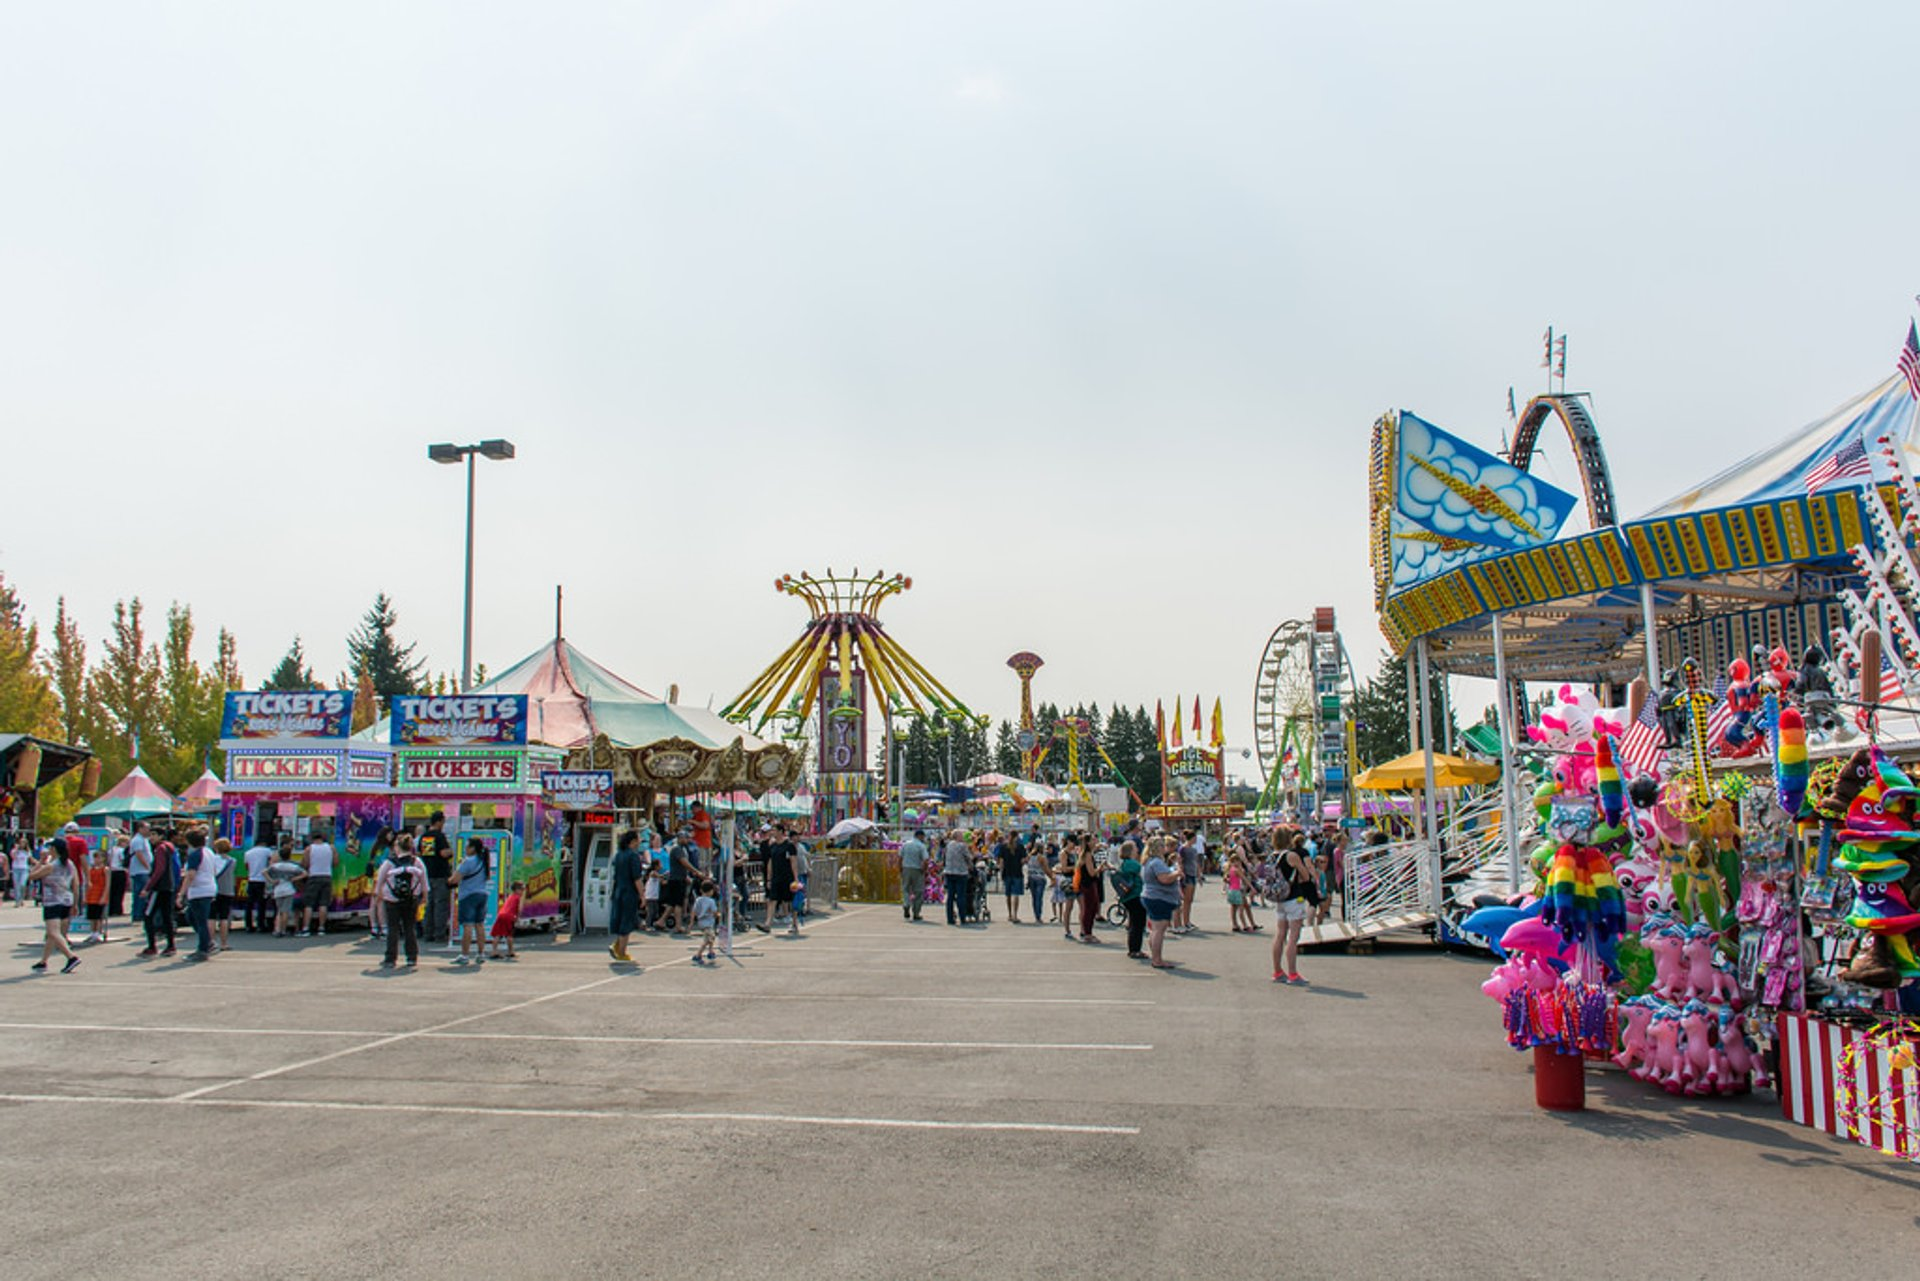 Evergreen State Fair in Seattle - Best Season 2020